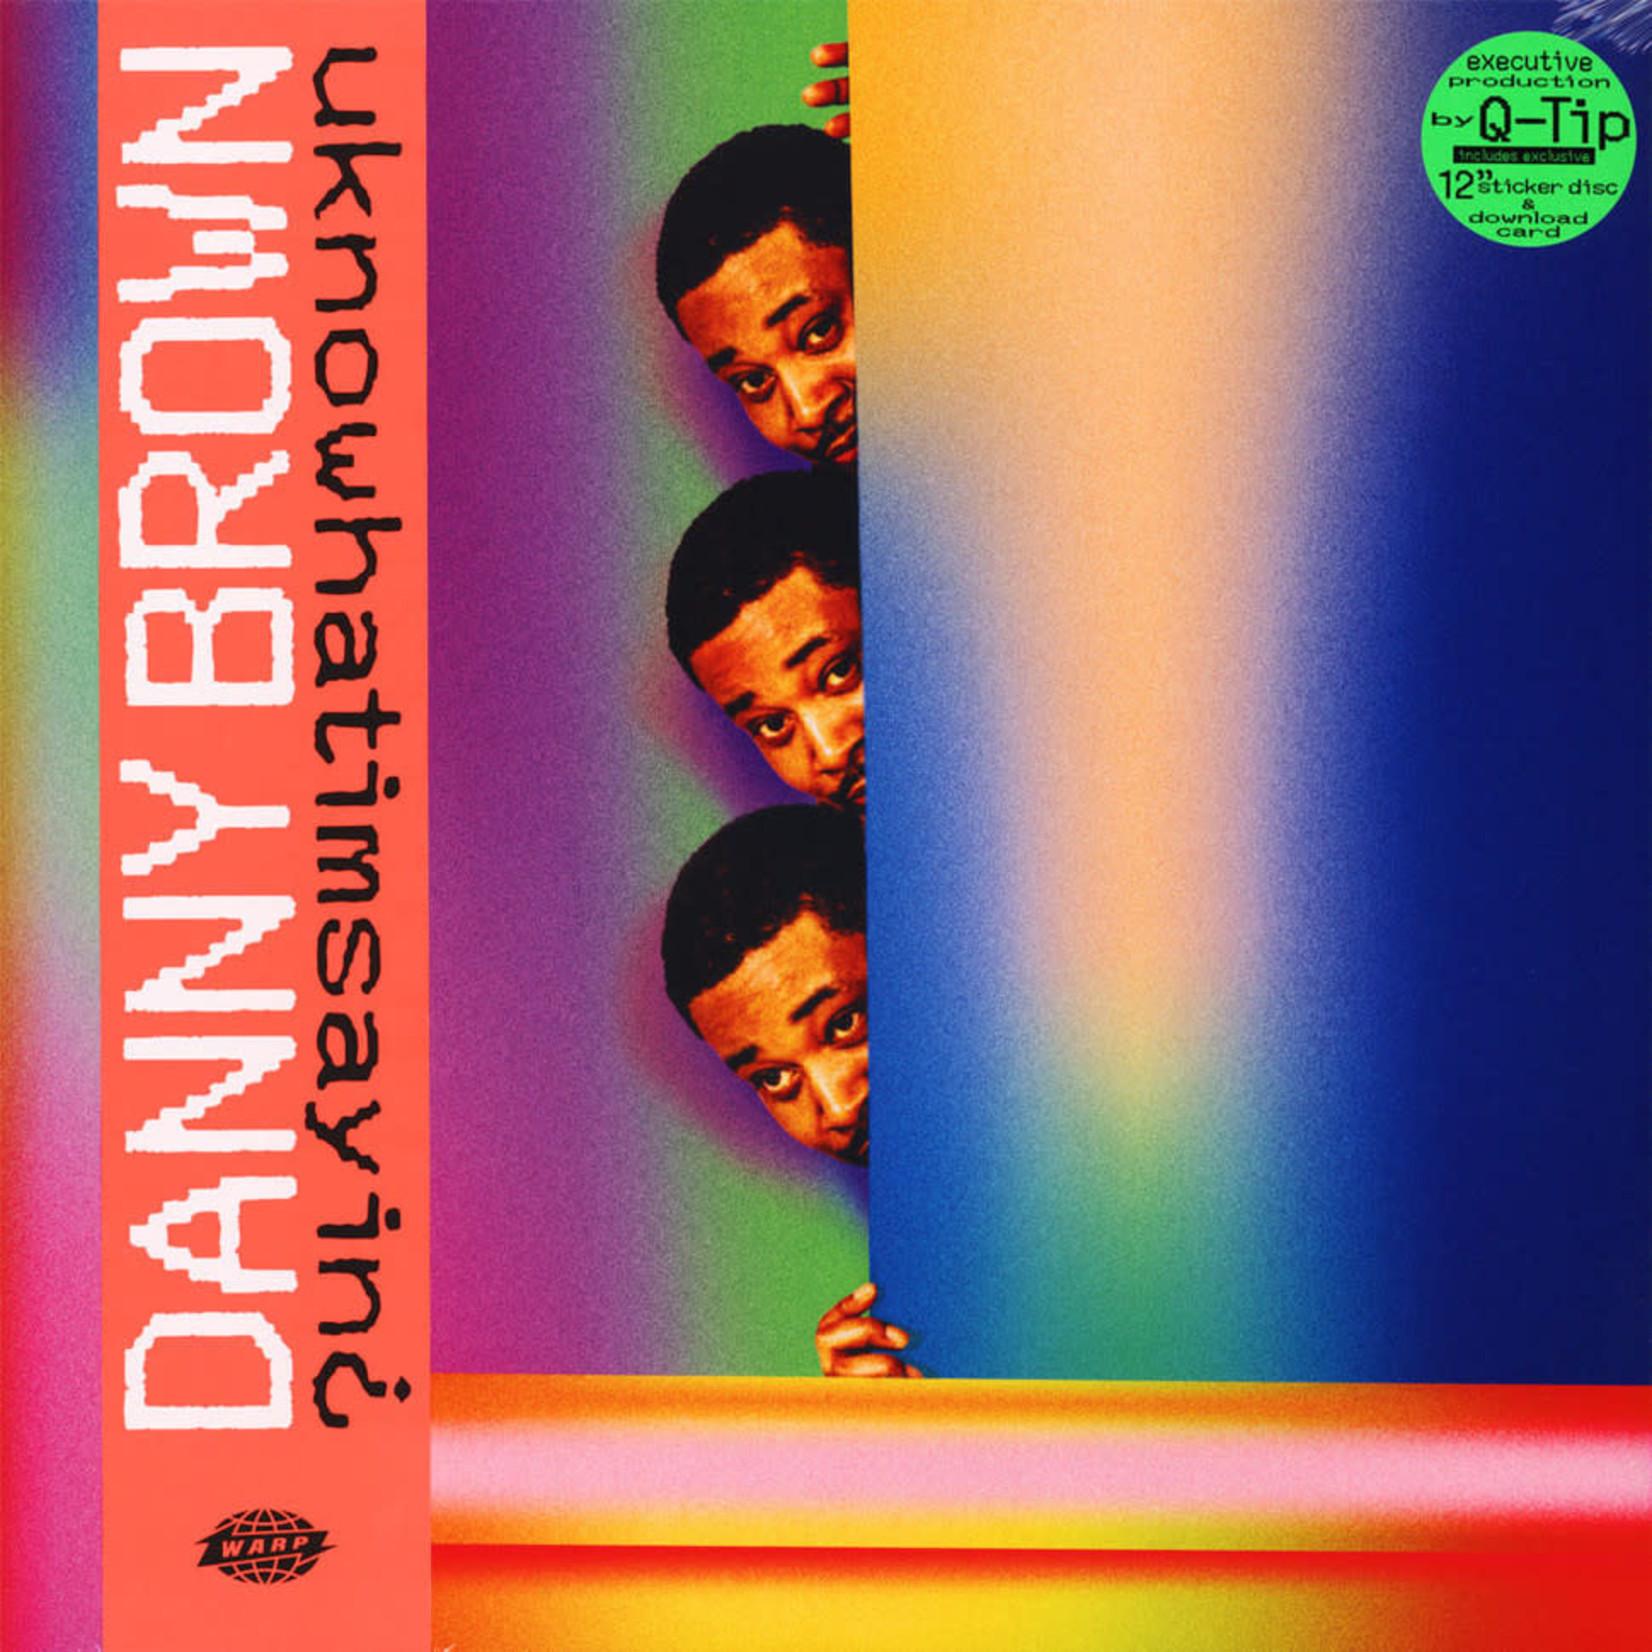 [New] Brown, Danny: Uknowhatimsayin